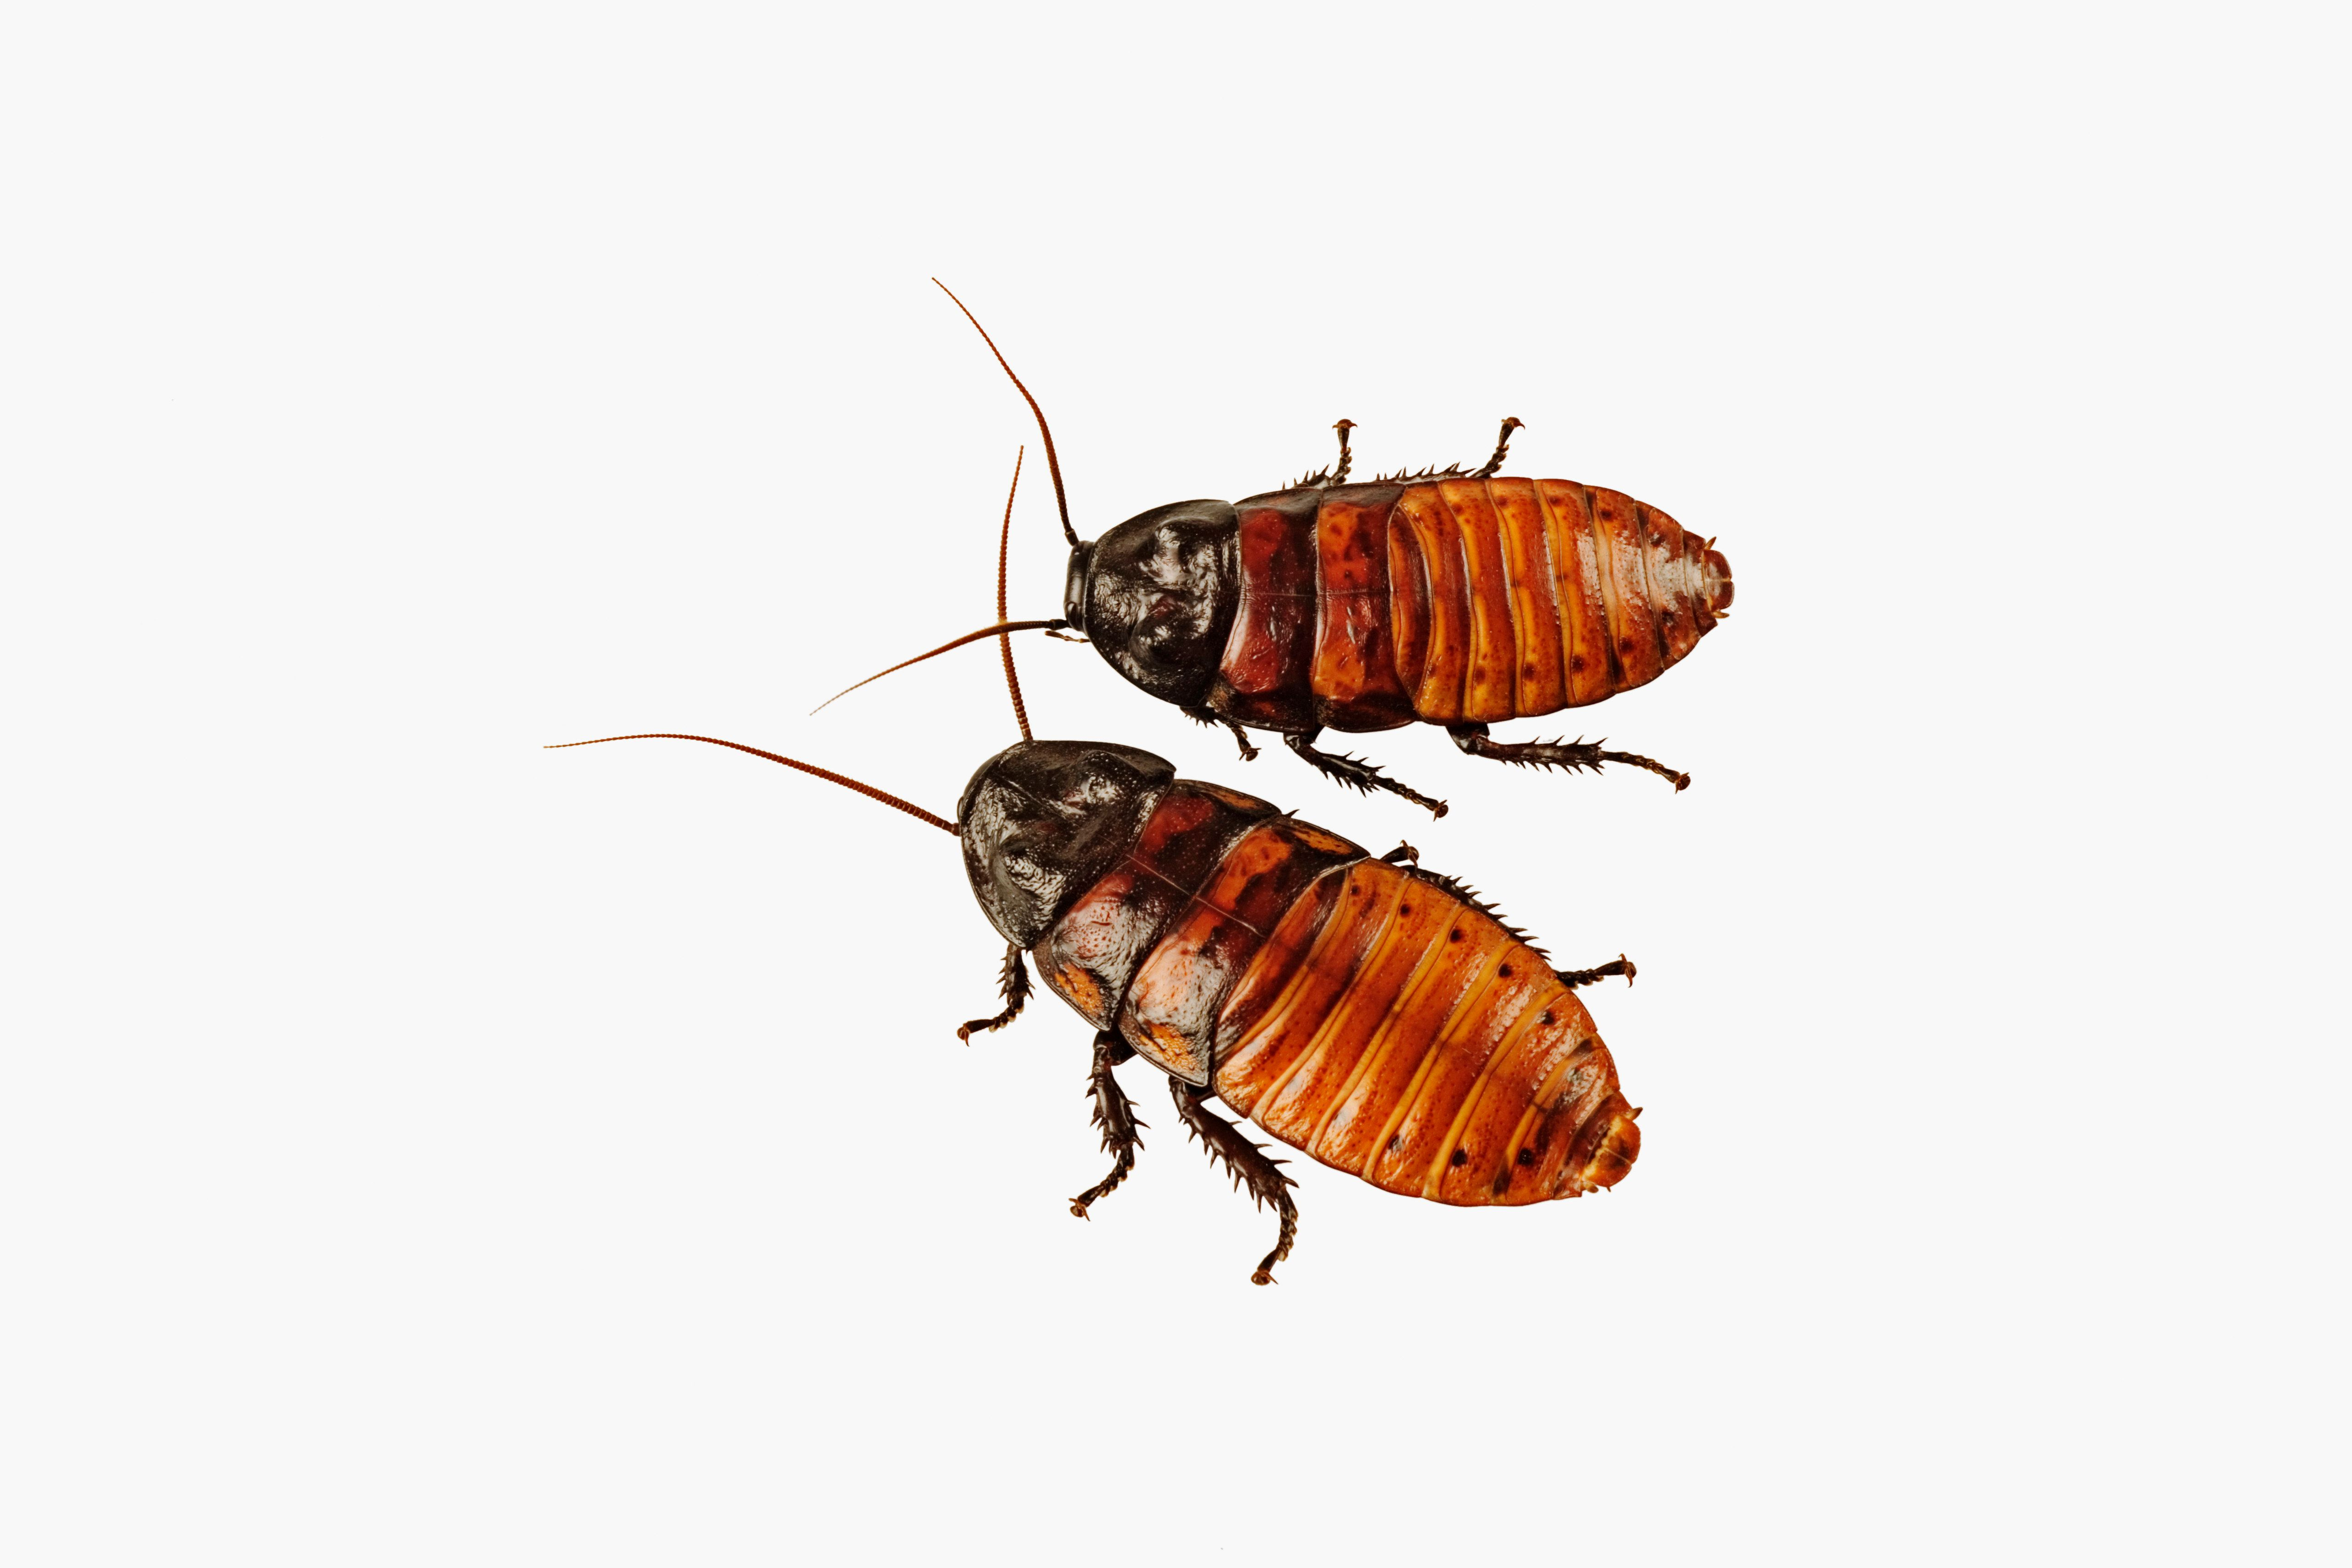 Studio Shot of Two Cockroaches